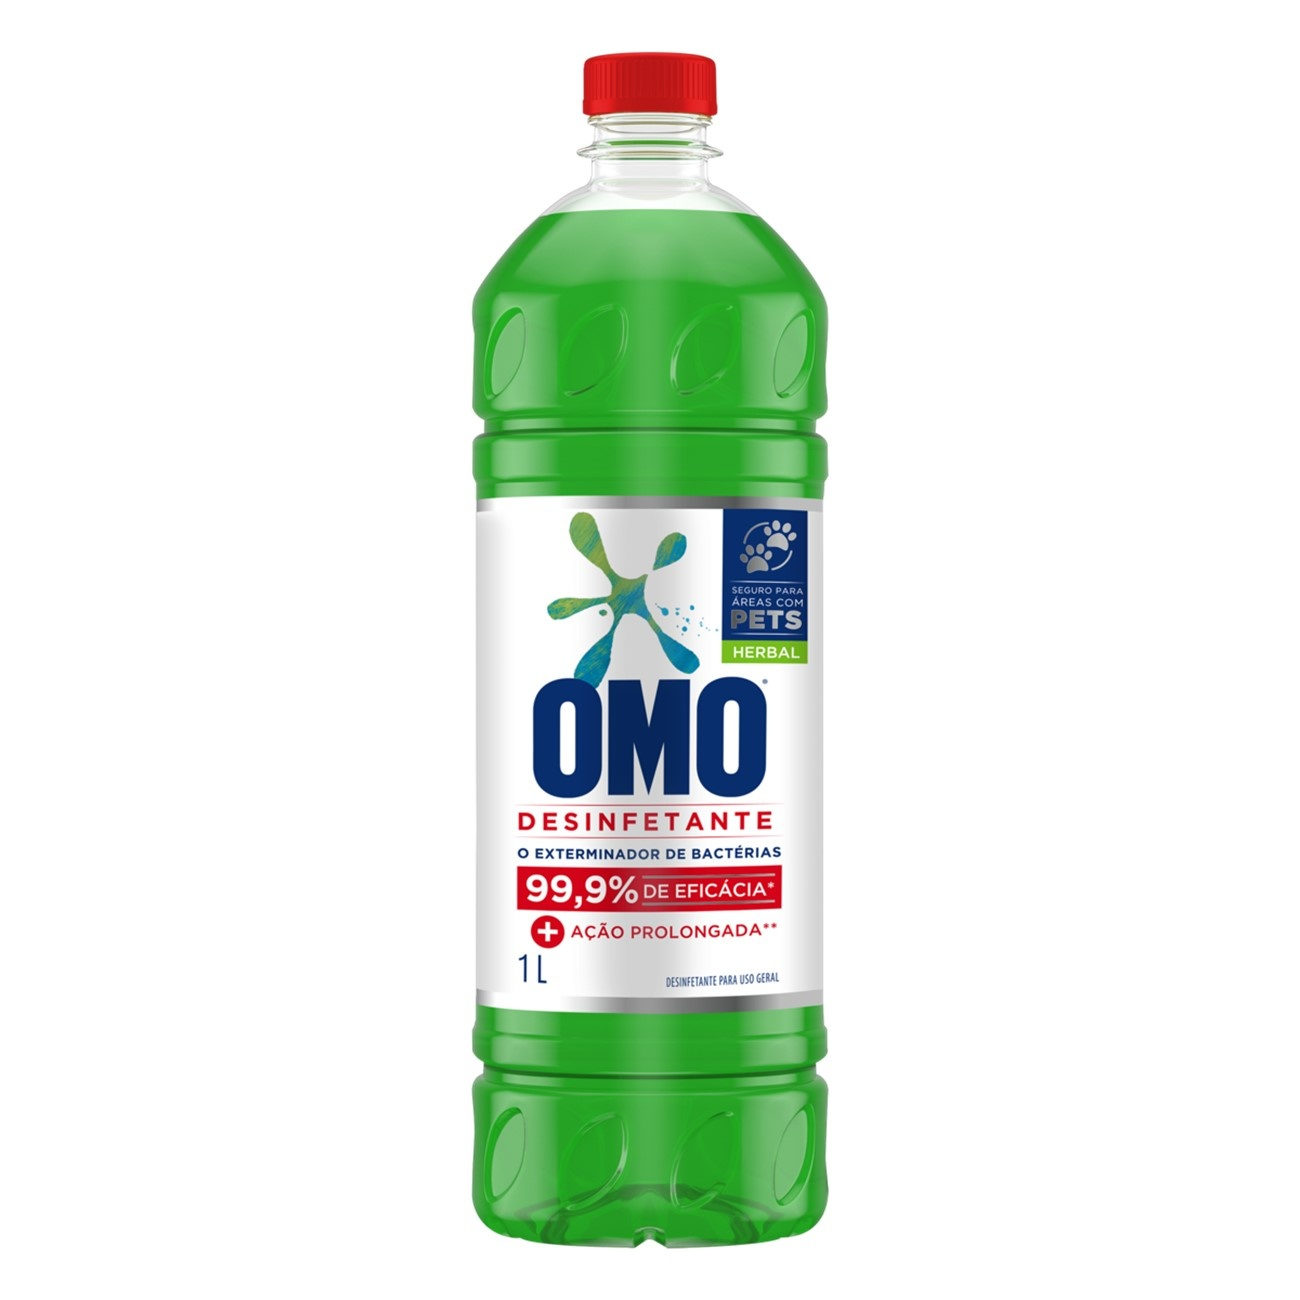 Desinfetante Omo Uso Geral Herbal 1L